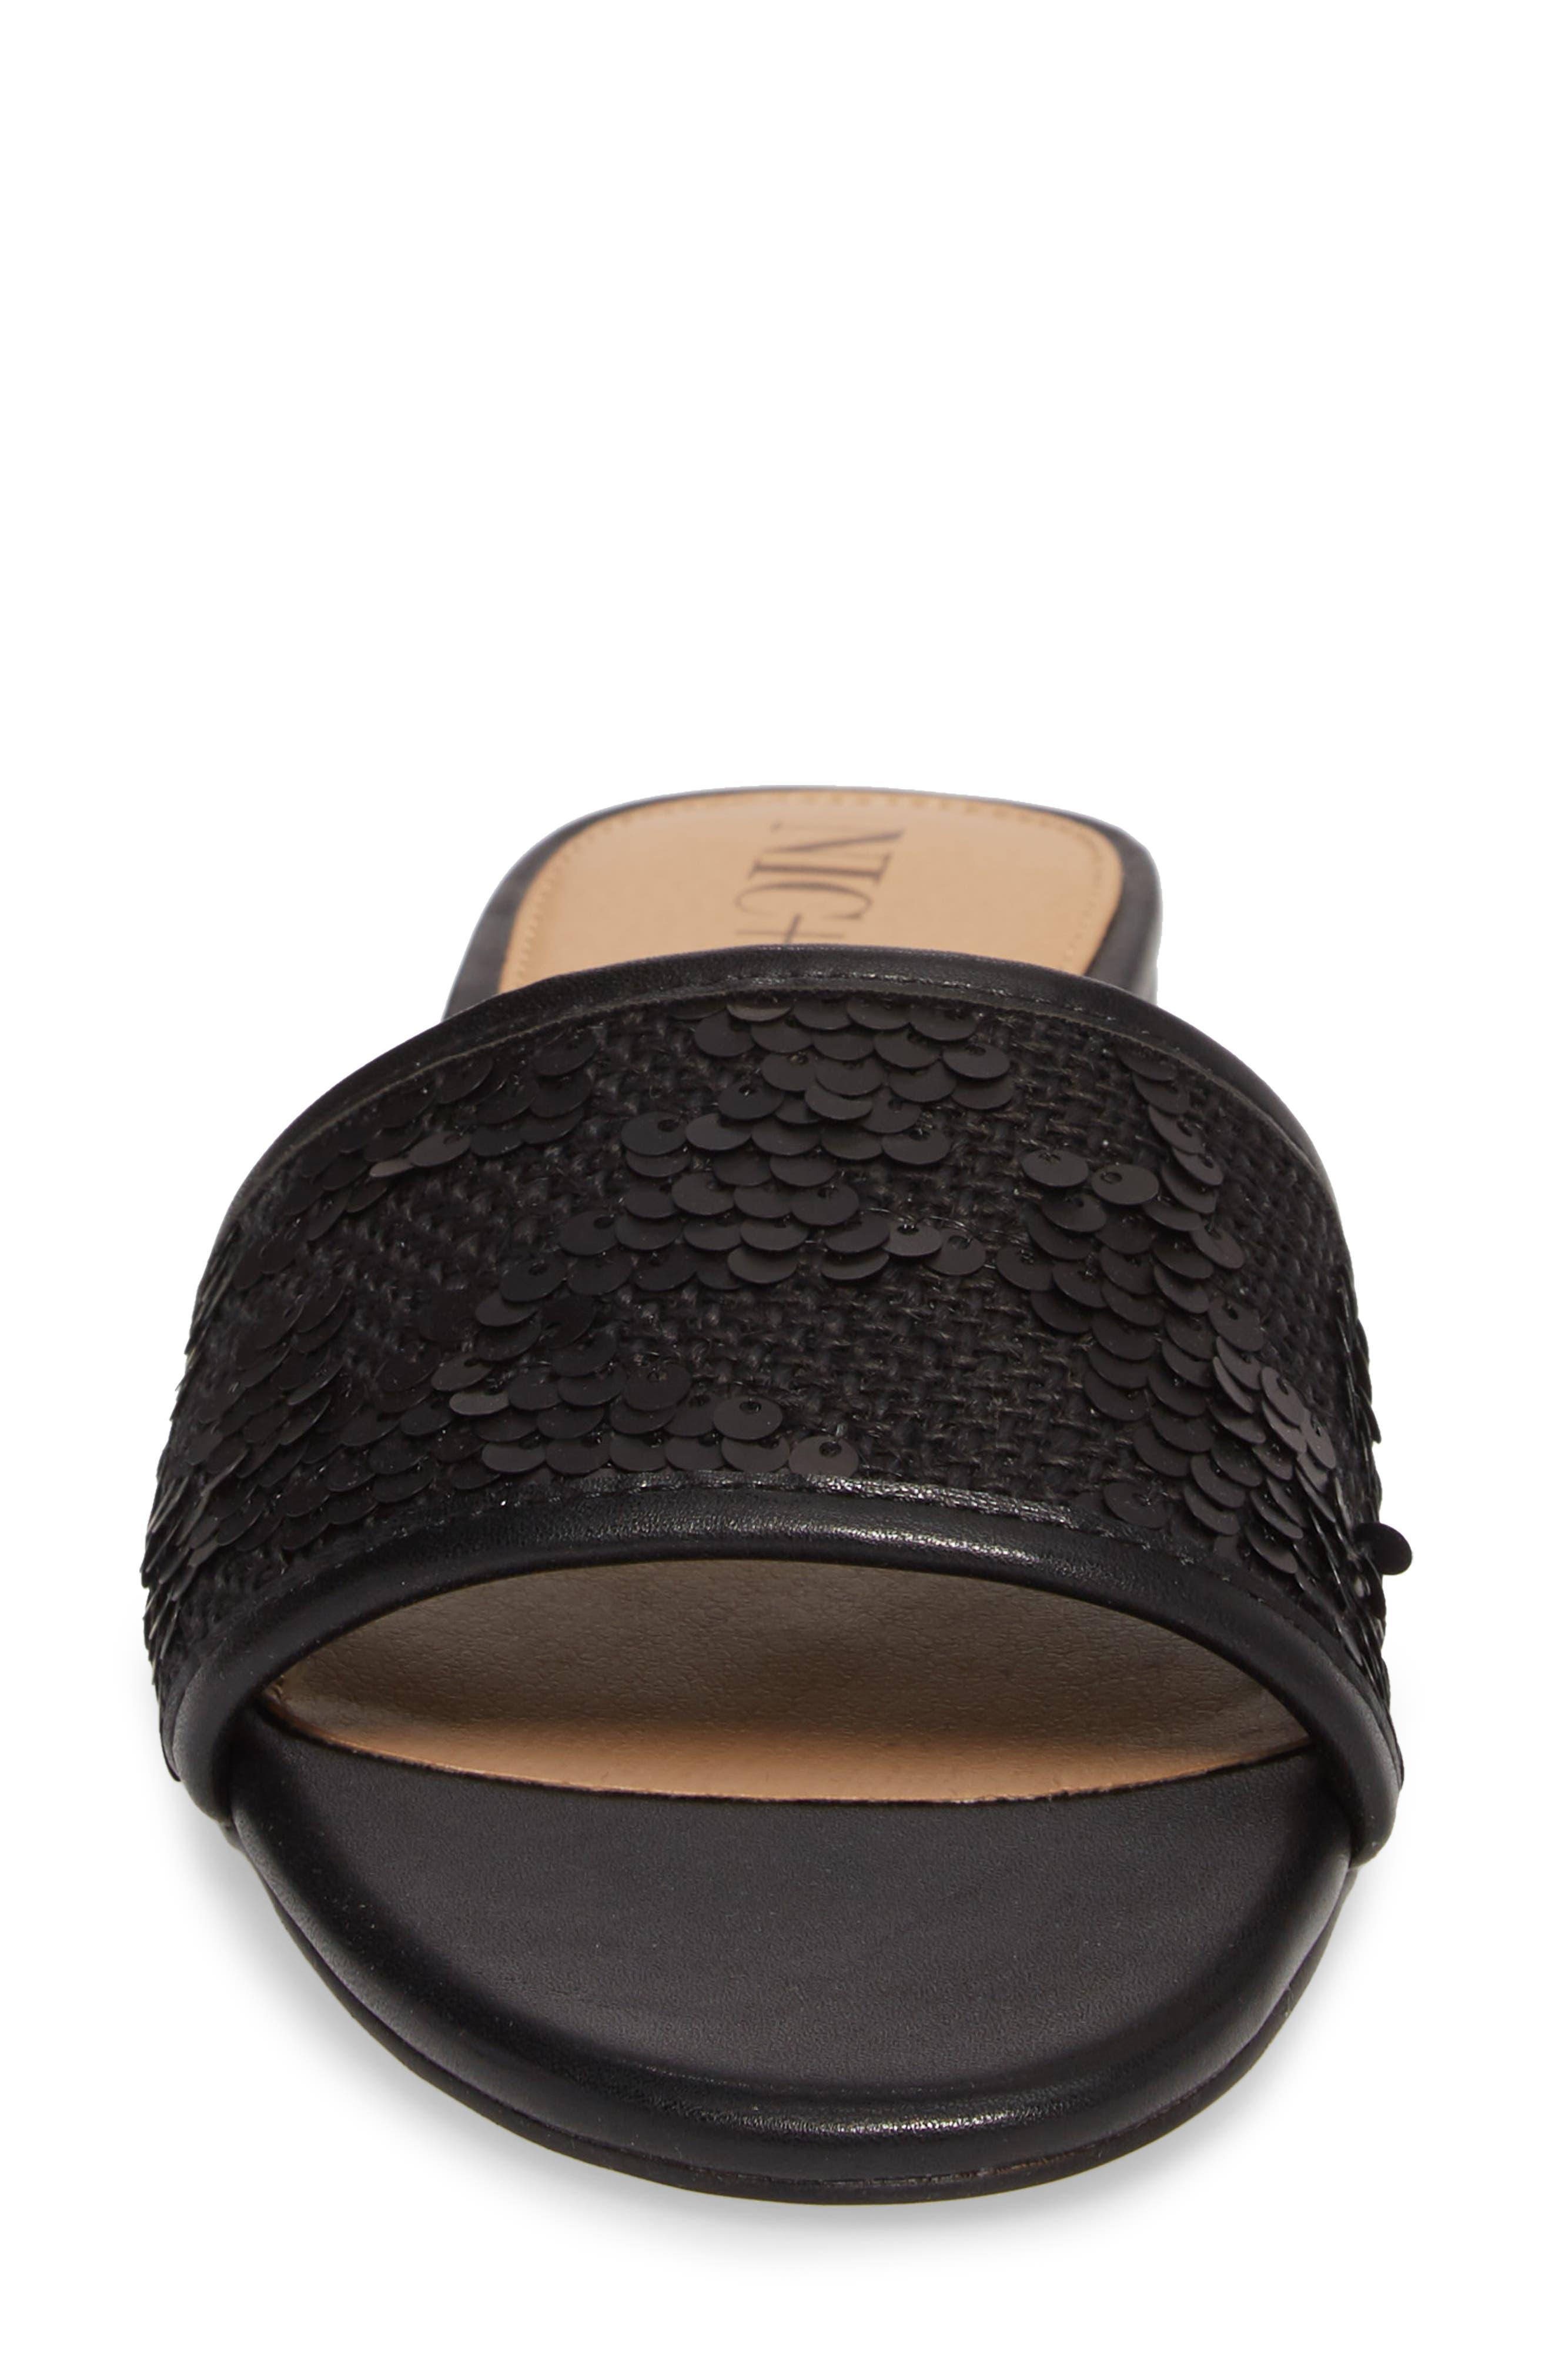 NIC + ZOE Sandy Sequin Low Heel Slide,                             Alternate thumbnail 4, color,                             Black Fabric